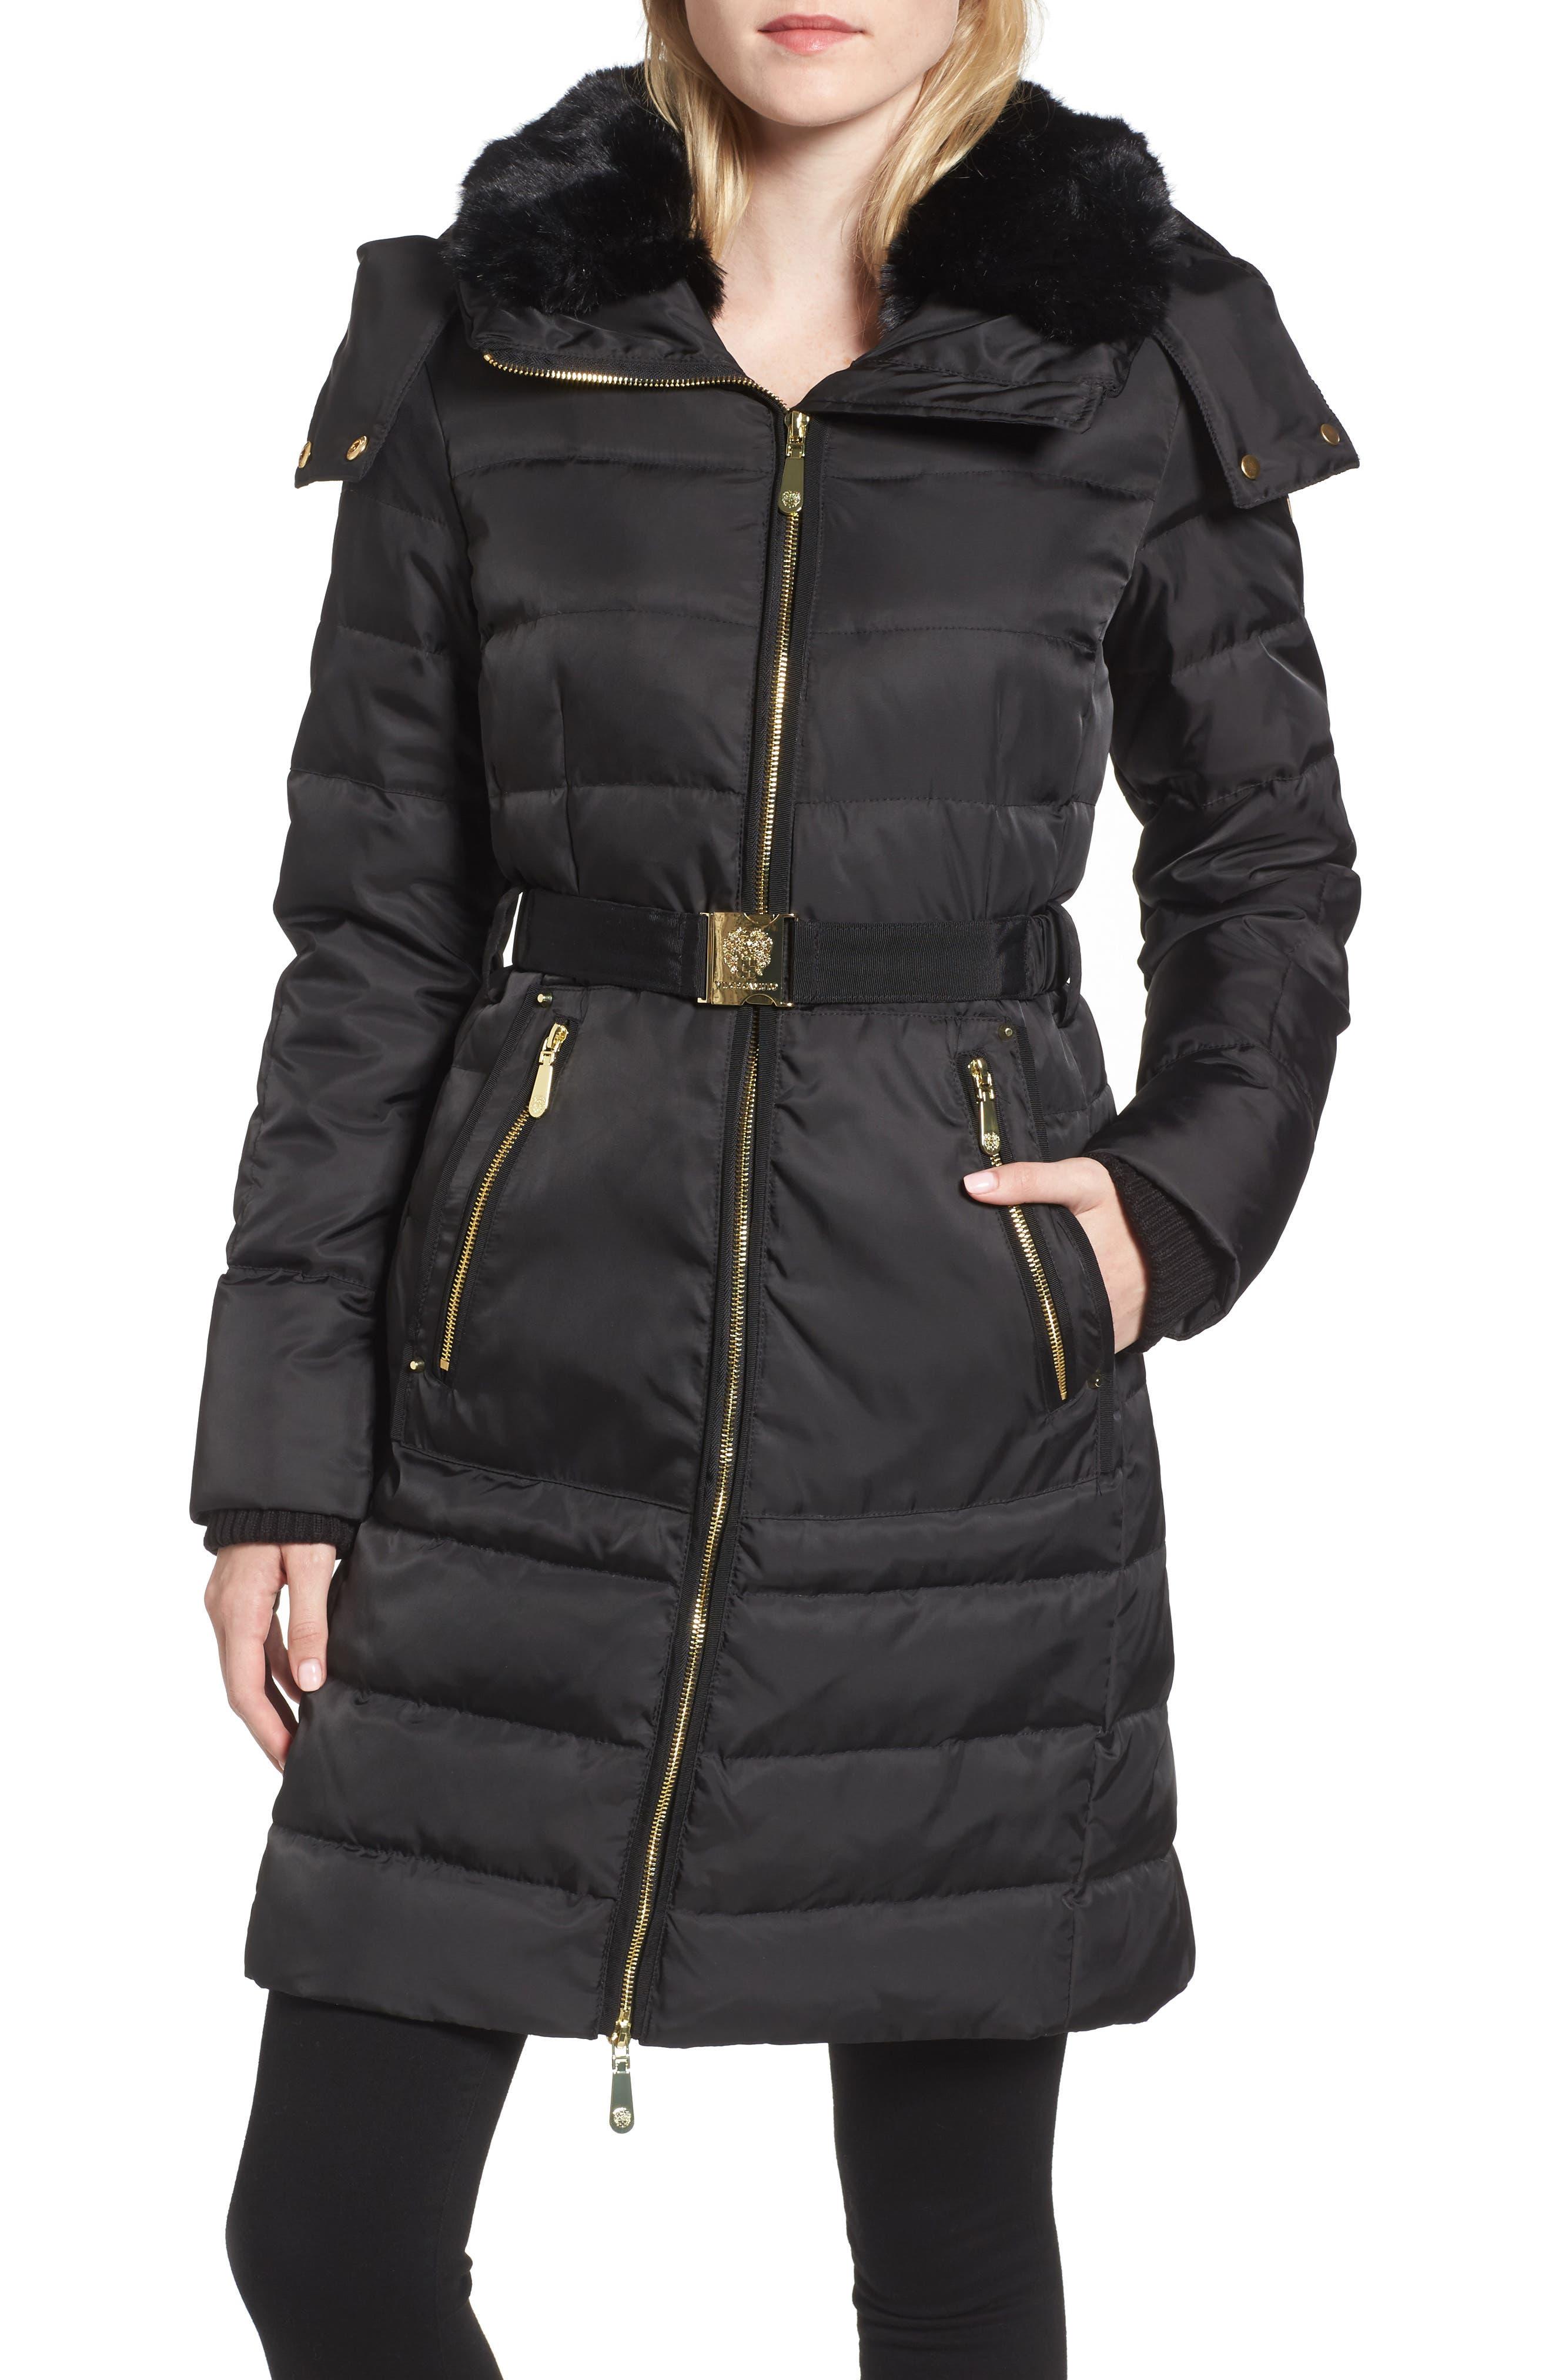 Belted Coat with Detachable Faux Fur,                             Main thumbnail 1, color,                             Black